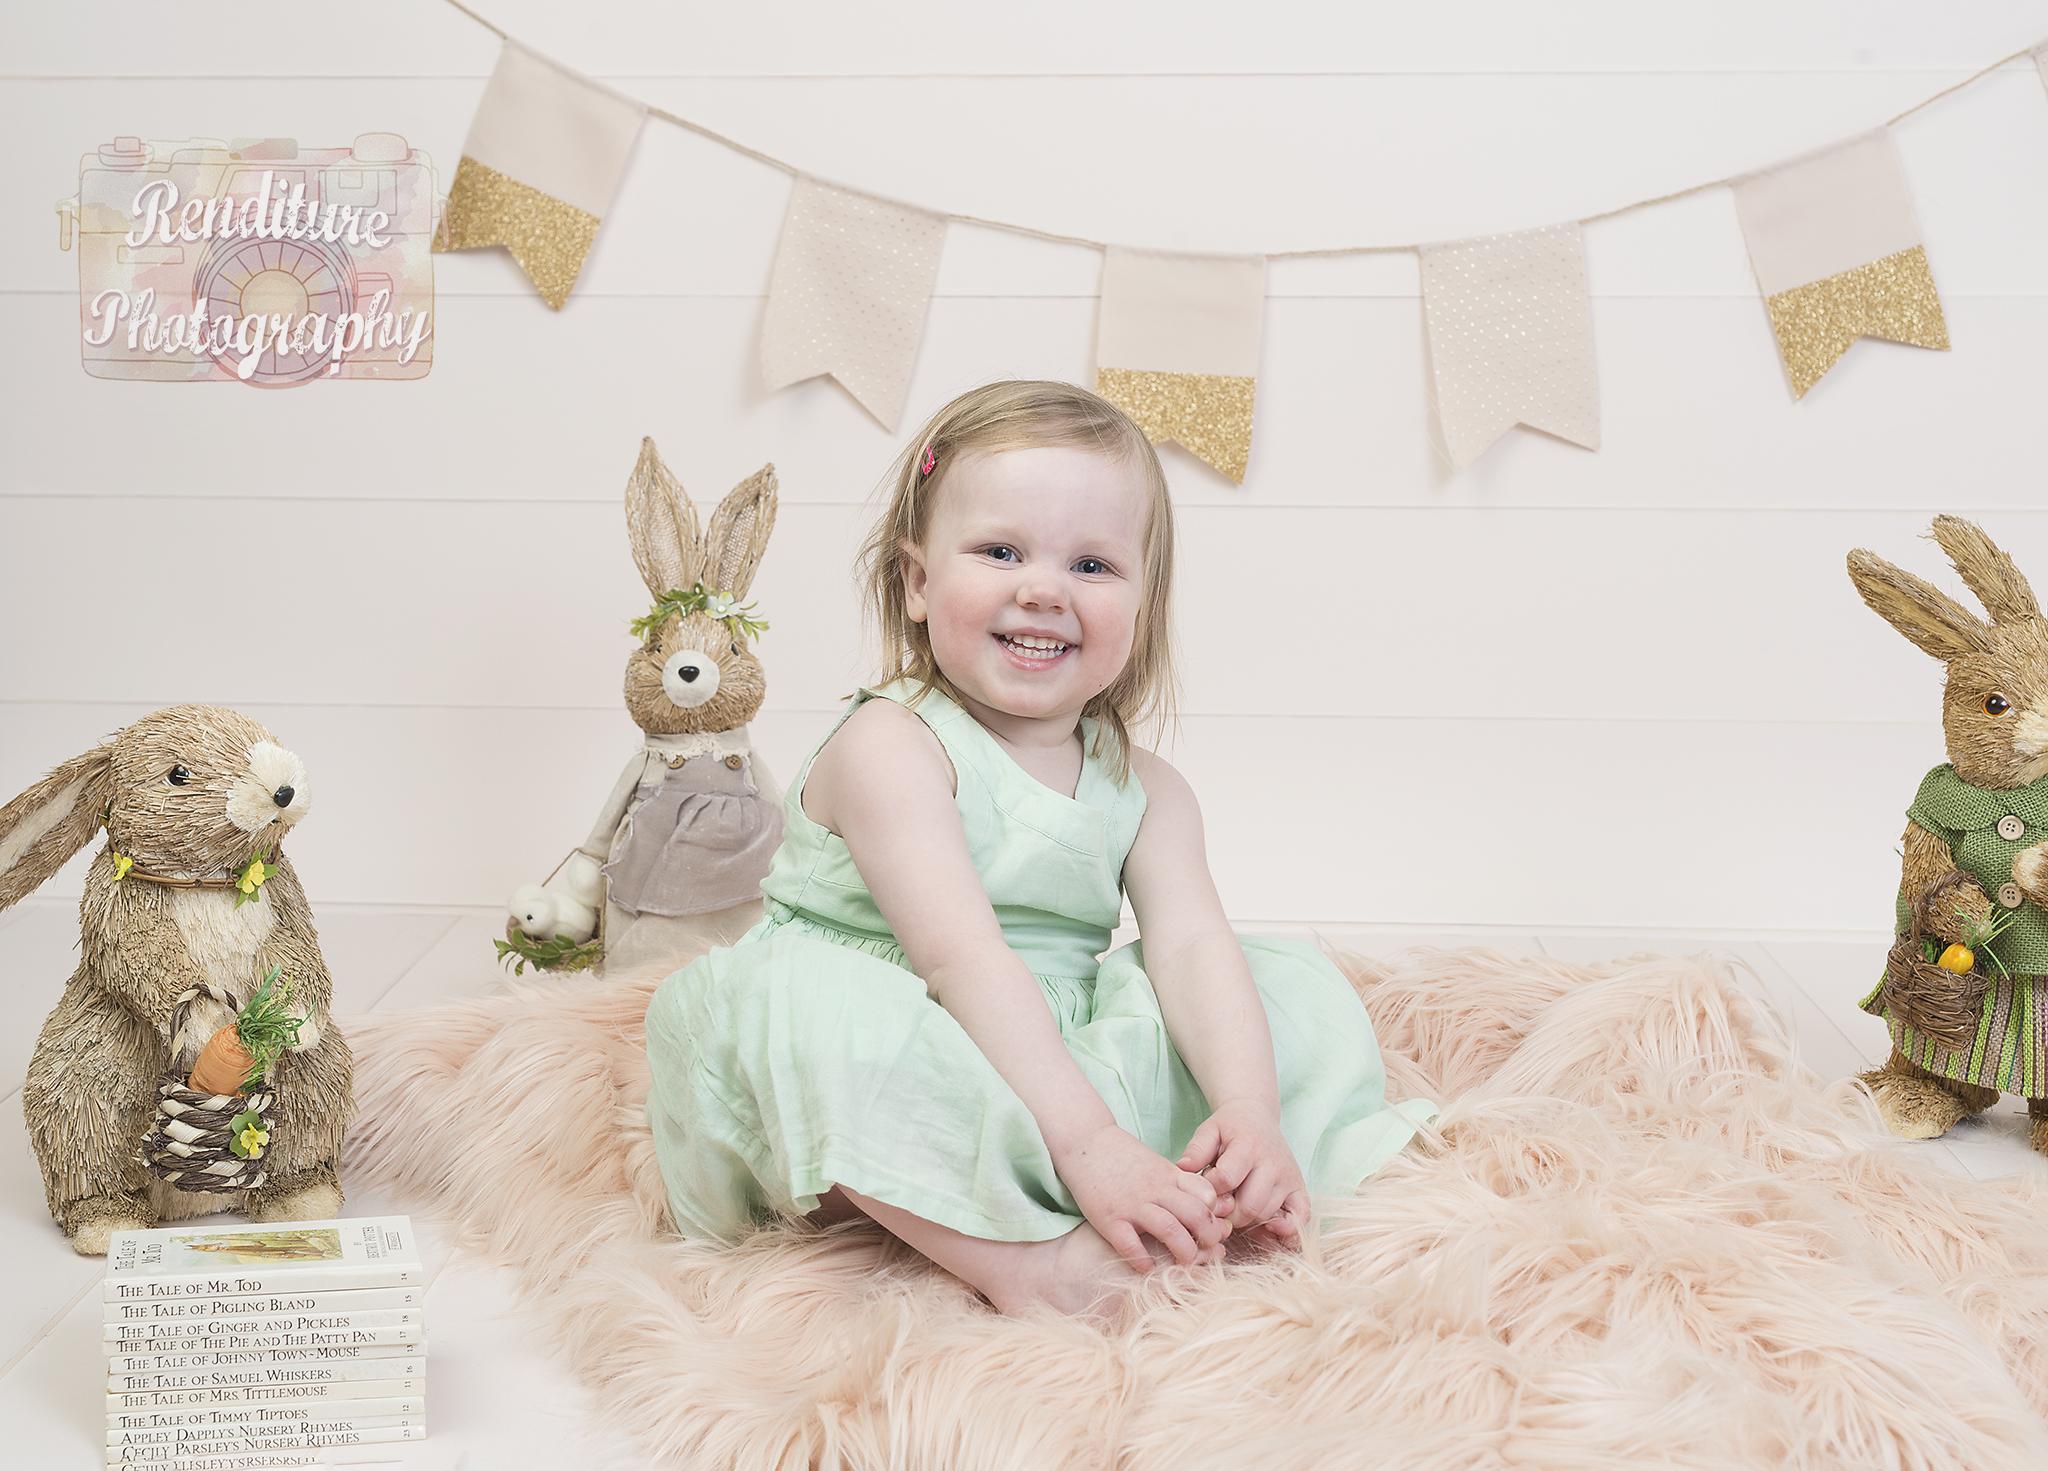 Saskatoon-Newborn-Family-Renditure-Baby-Photography-Photographer-Maternity-Pregnancy-Saskatchewan-323 FBR.jpg